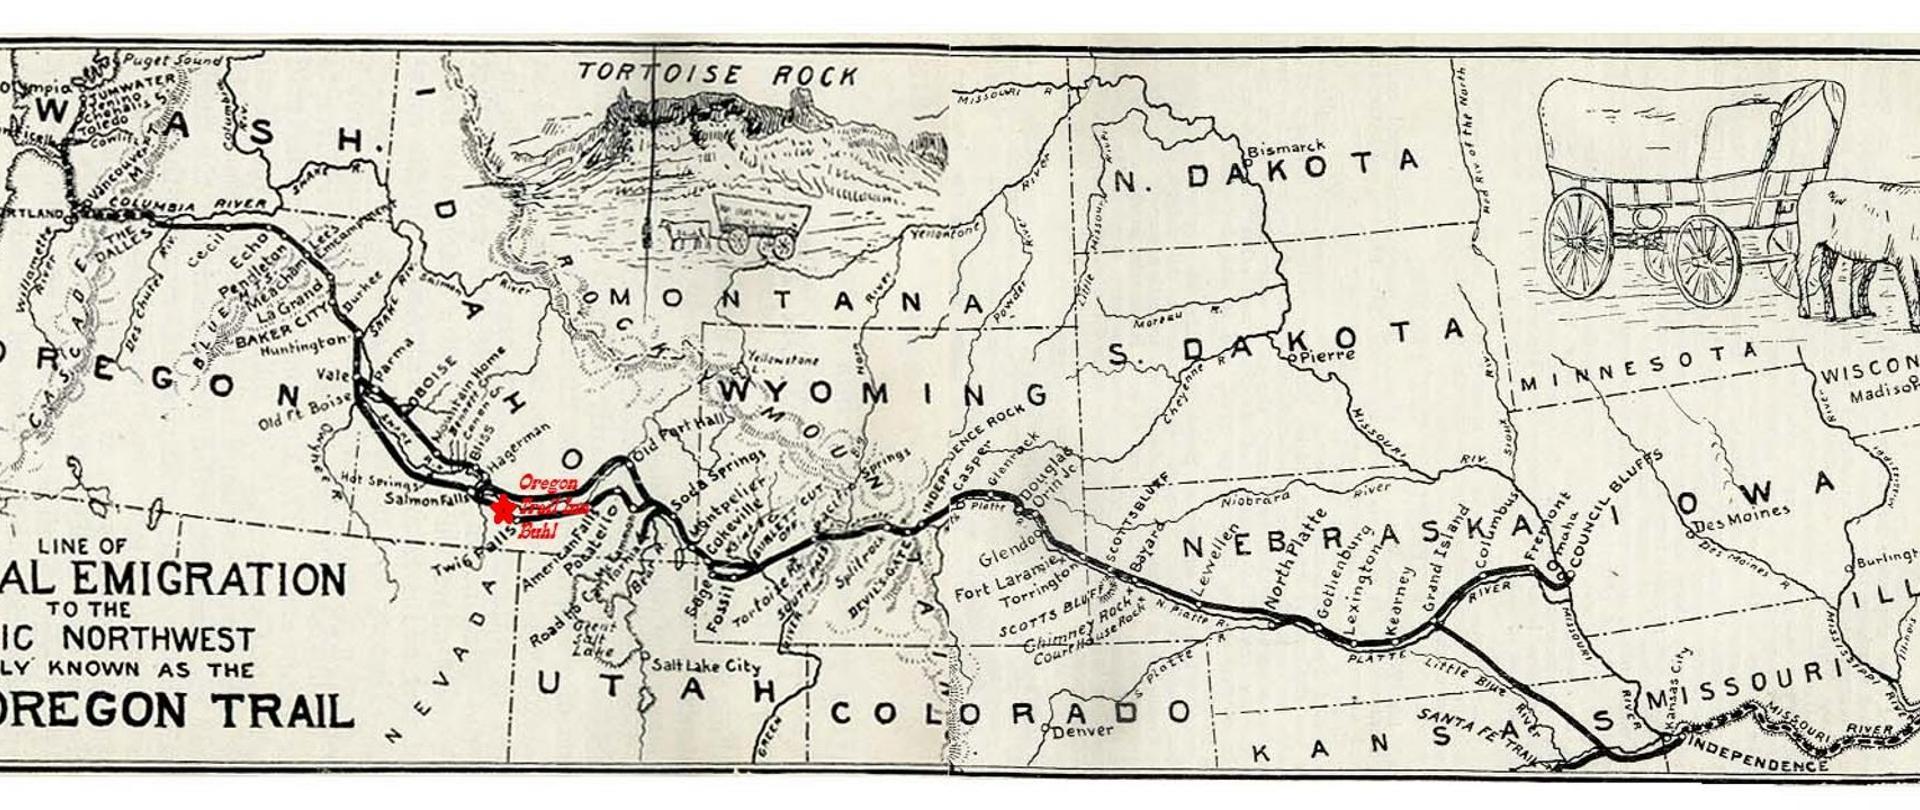 Oregontrail_1907 w Buhl.jpg